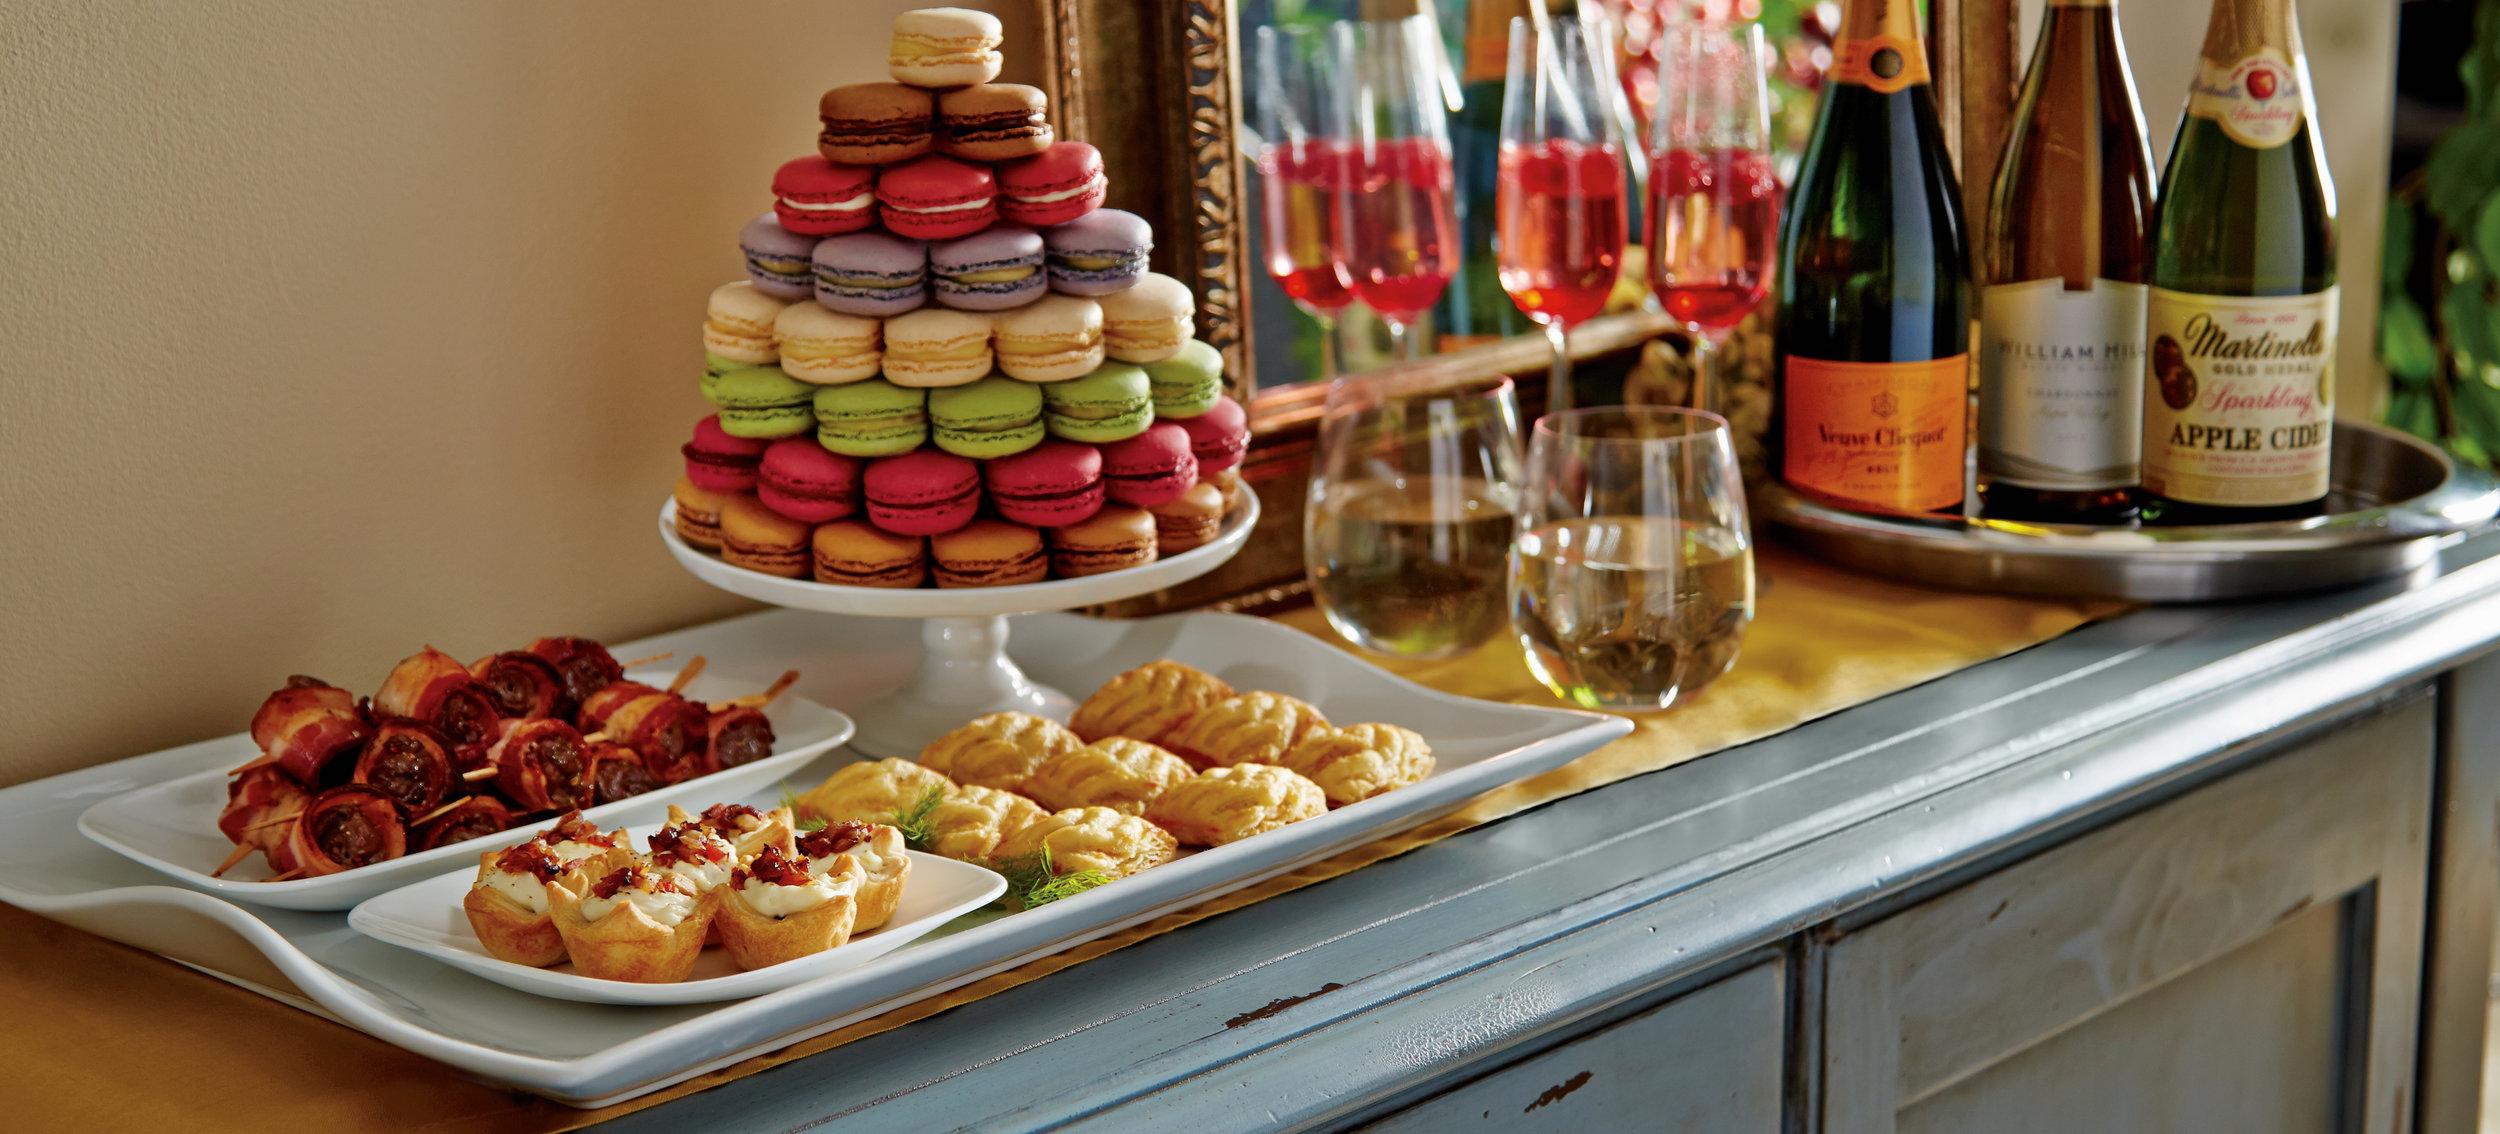 20A_Appetizer_Dessert_Spread.jpg